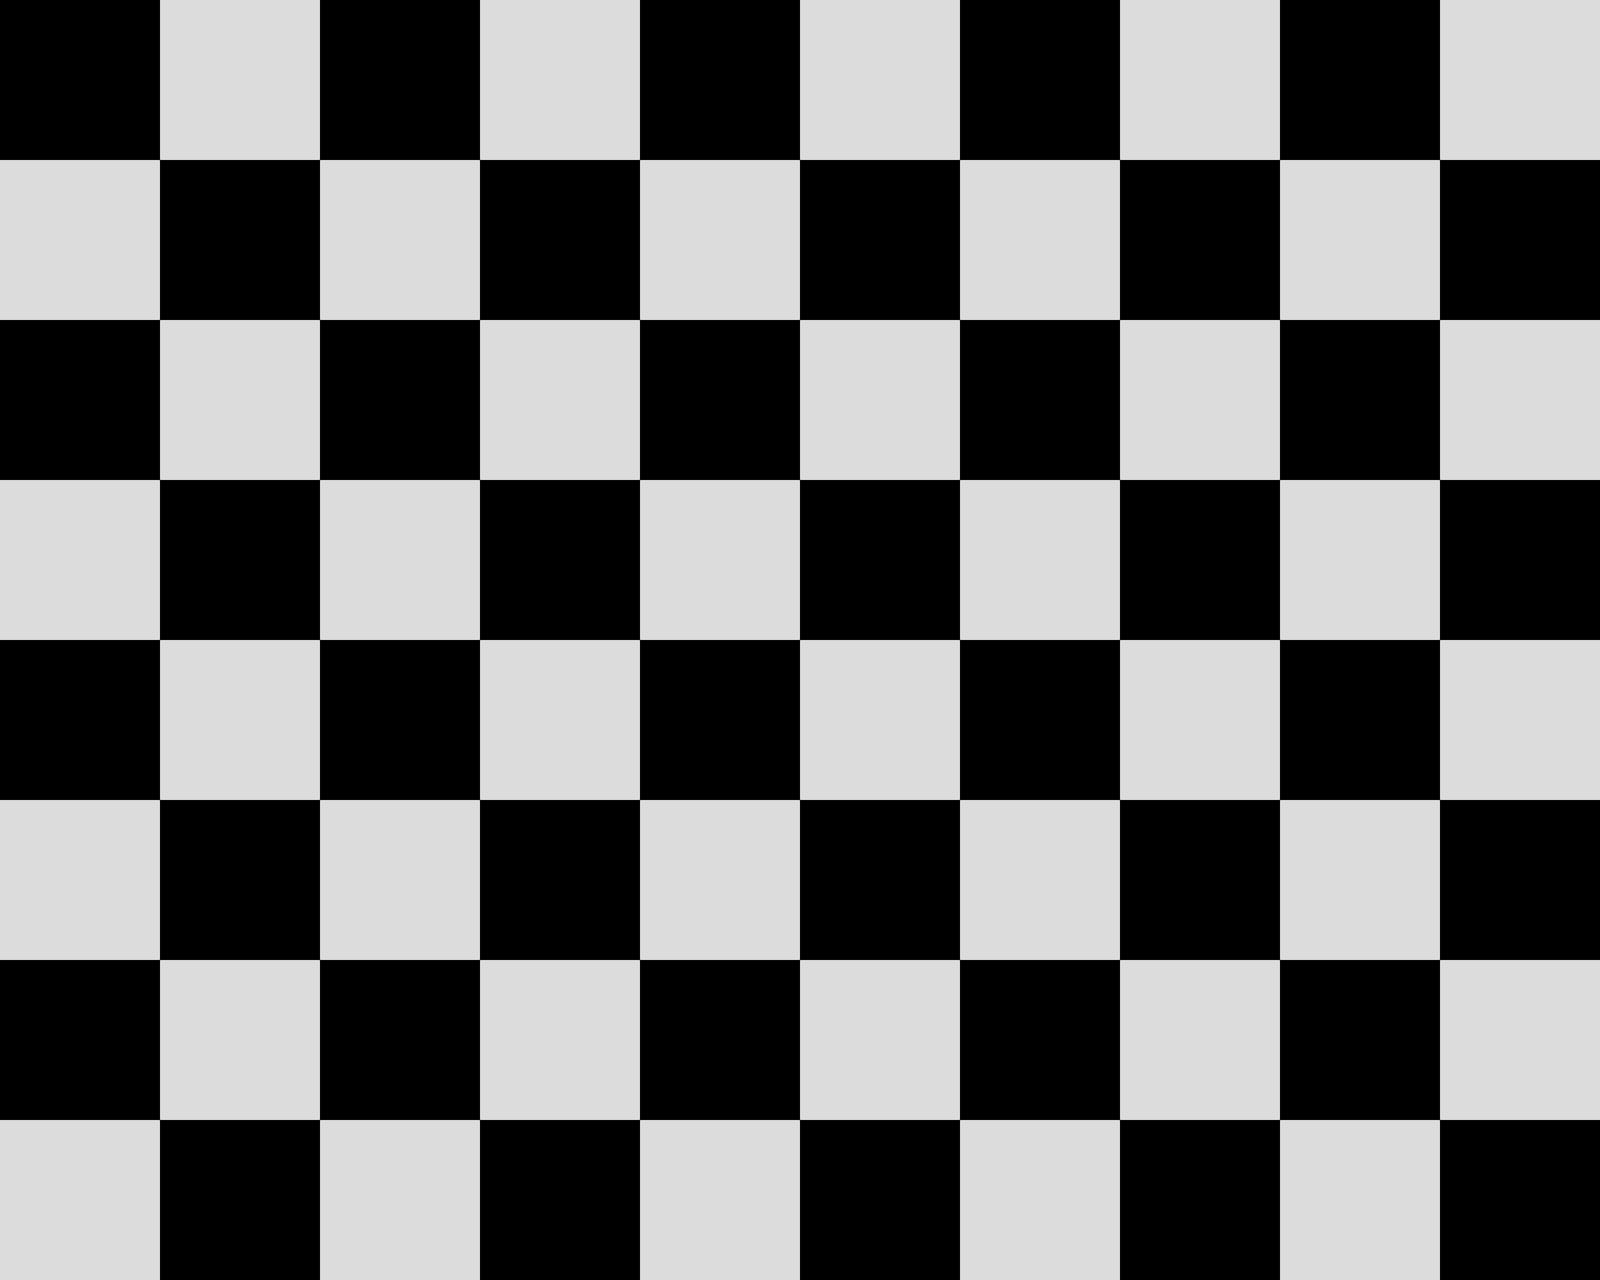 Wall Tv Design Black Amp White Checkered Wallpaper Wallpapersafari